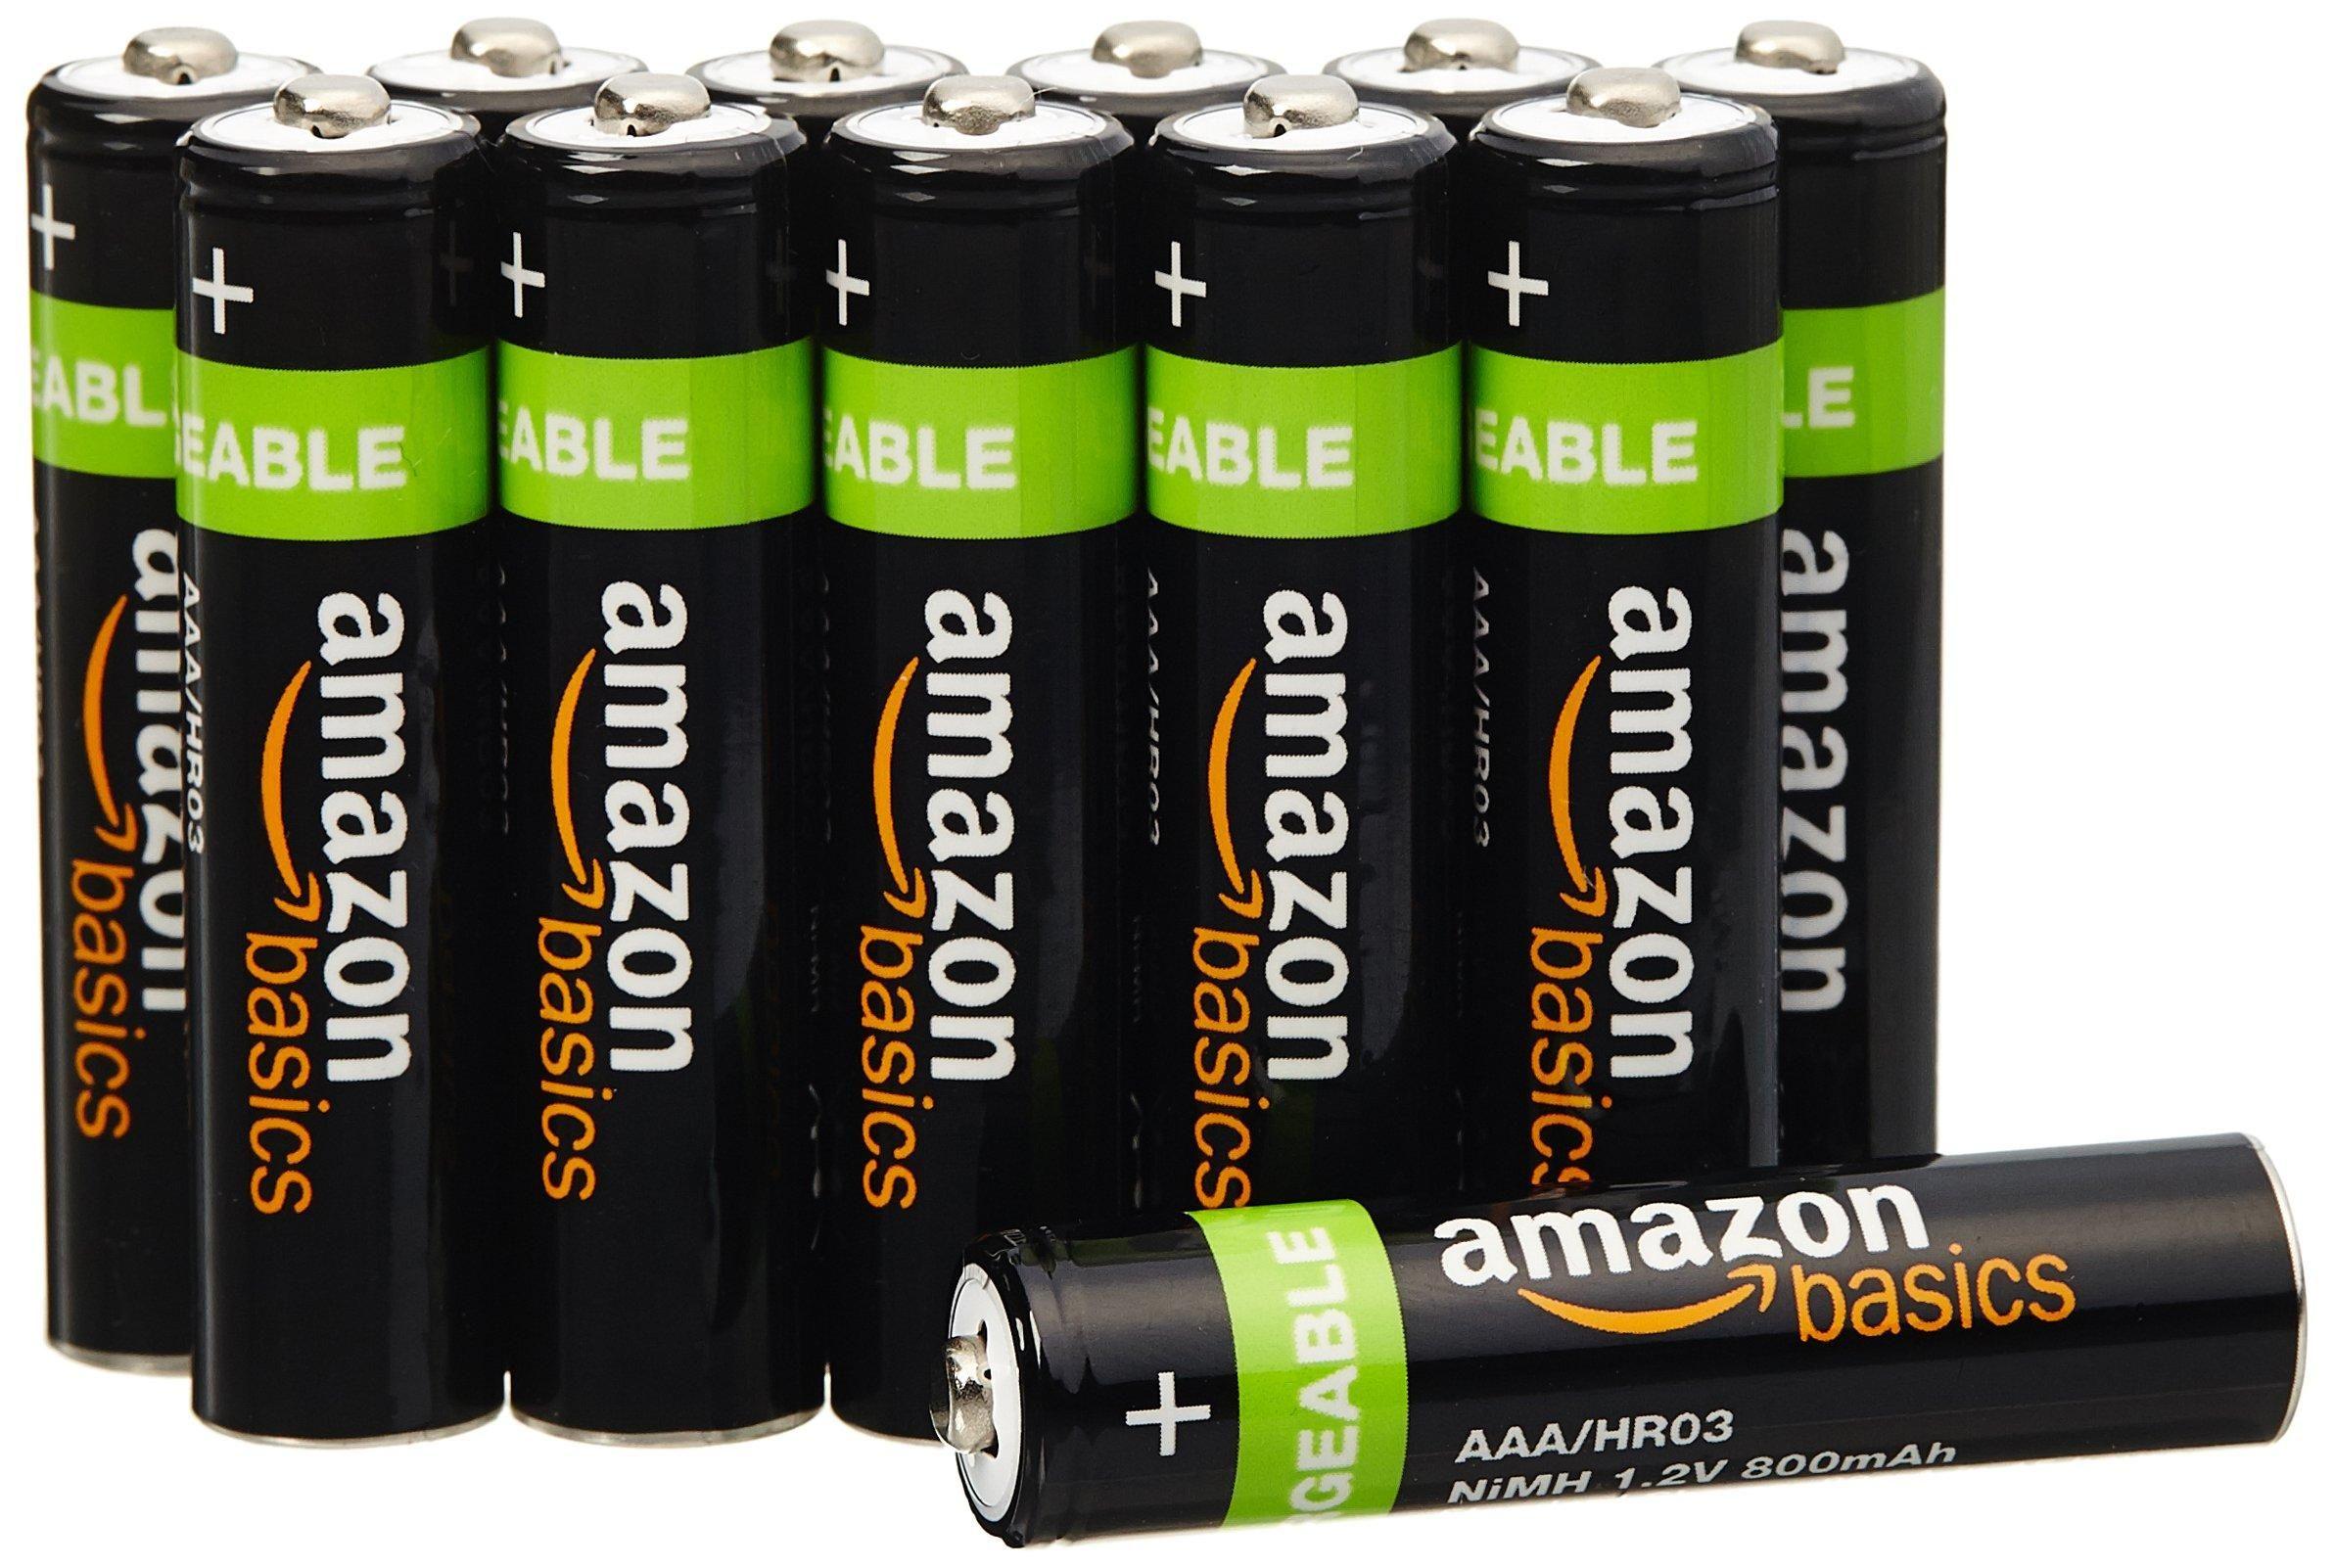 Best Price Aaa Batteries Rechargeable Batteries Batteries Recharge